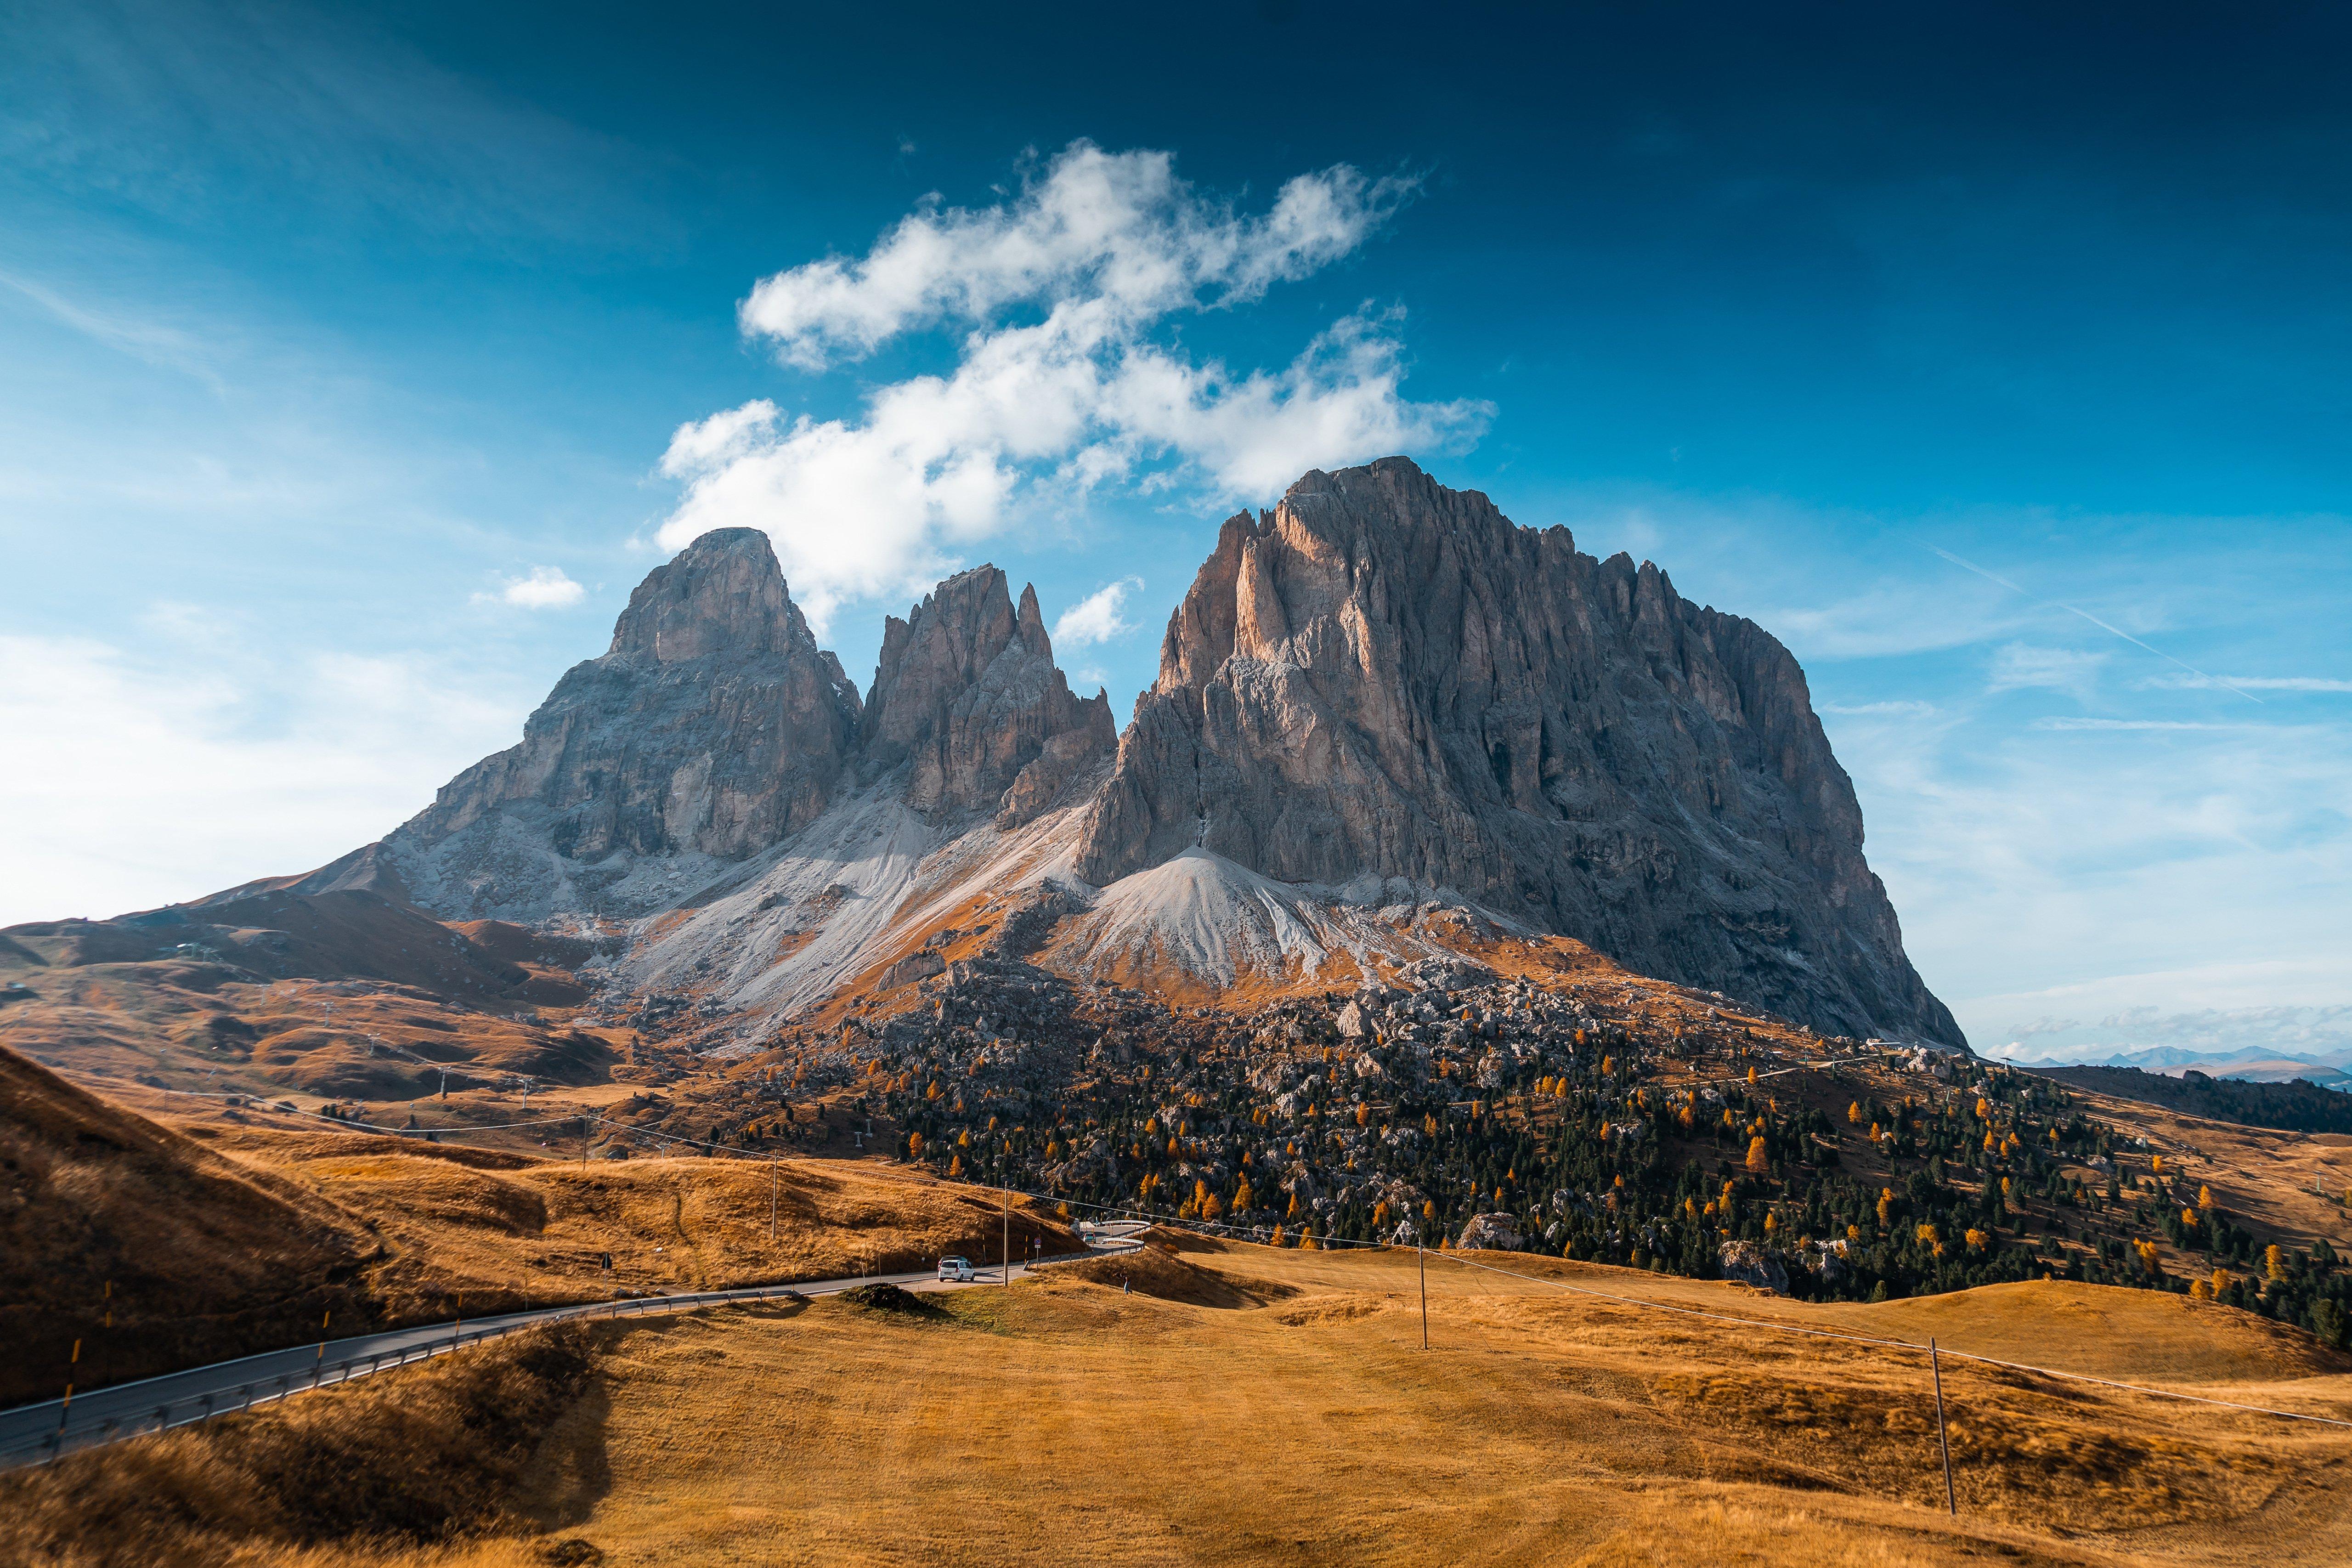 Fondos de pantalla Otoño en las montañas de Italia